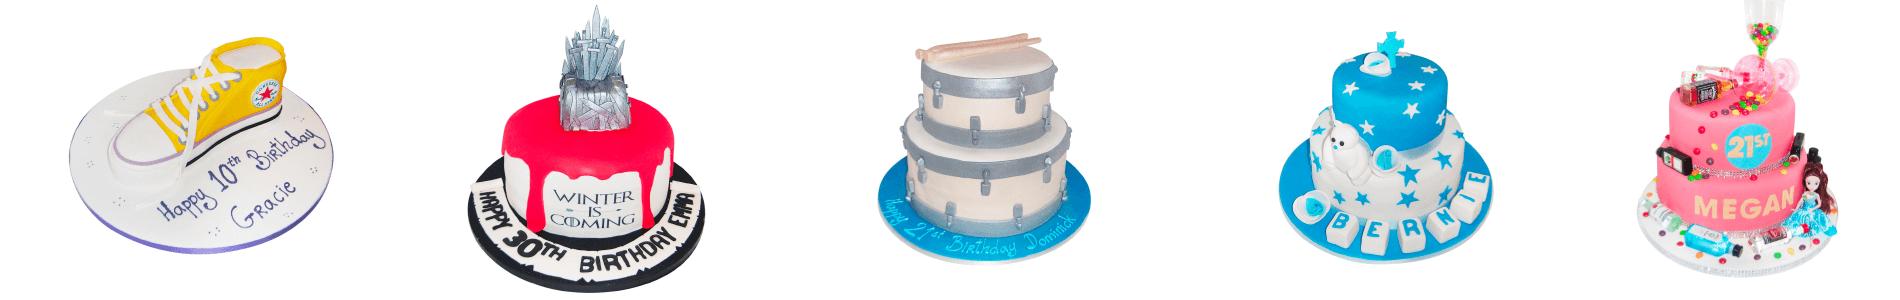 Five custom cakes